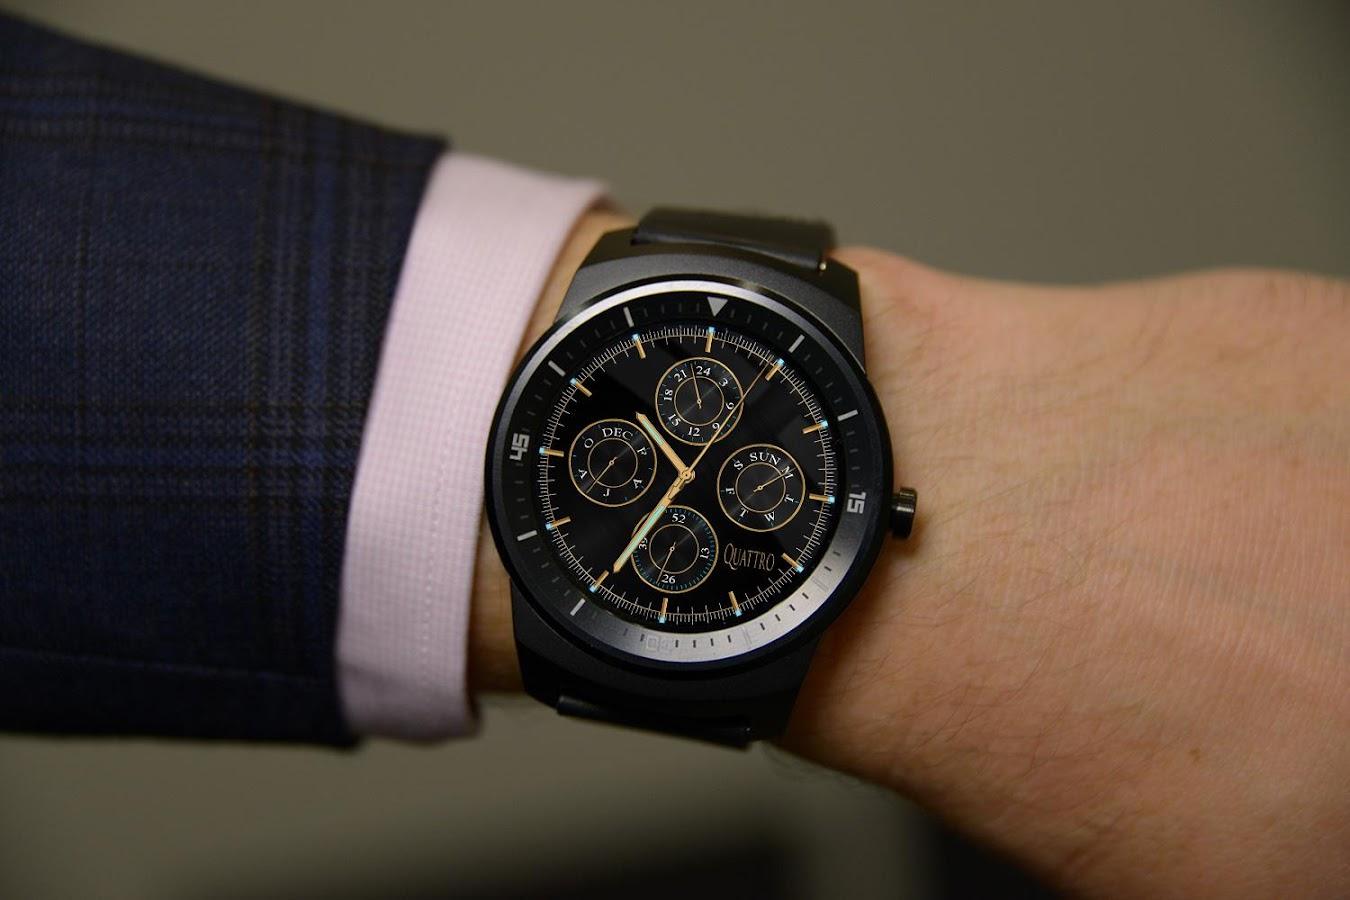 Designer android wear watchface - Watch Face Quattr Android Wear Screenshot